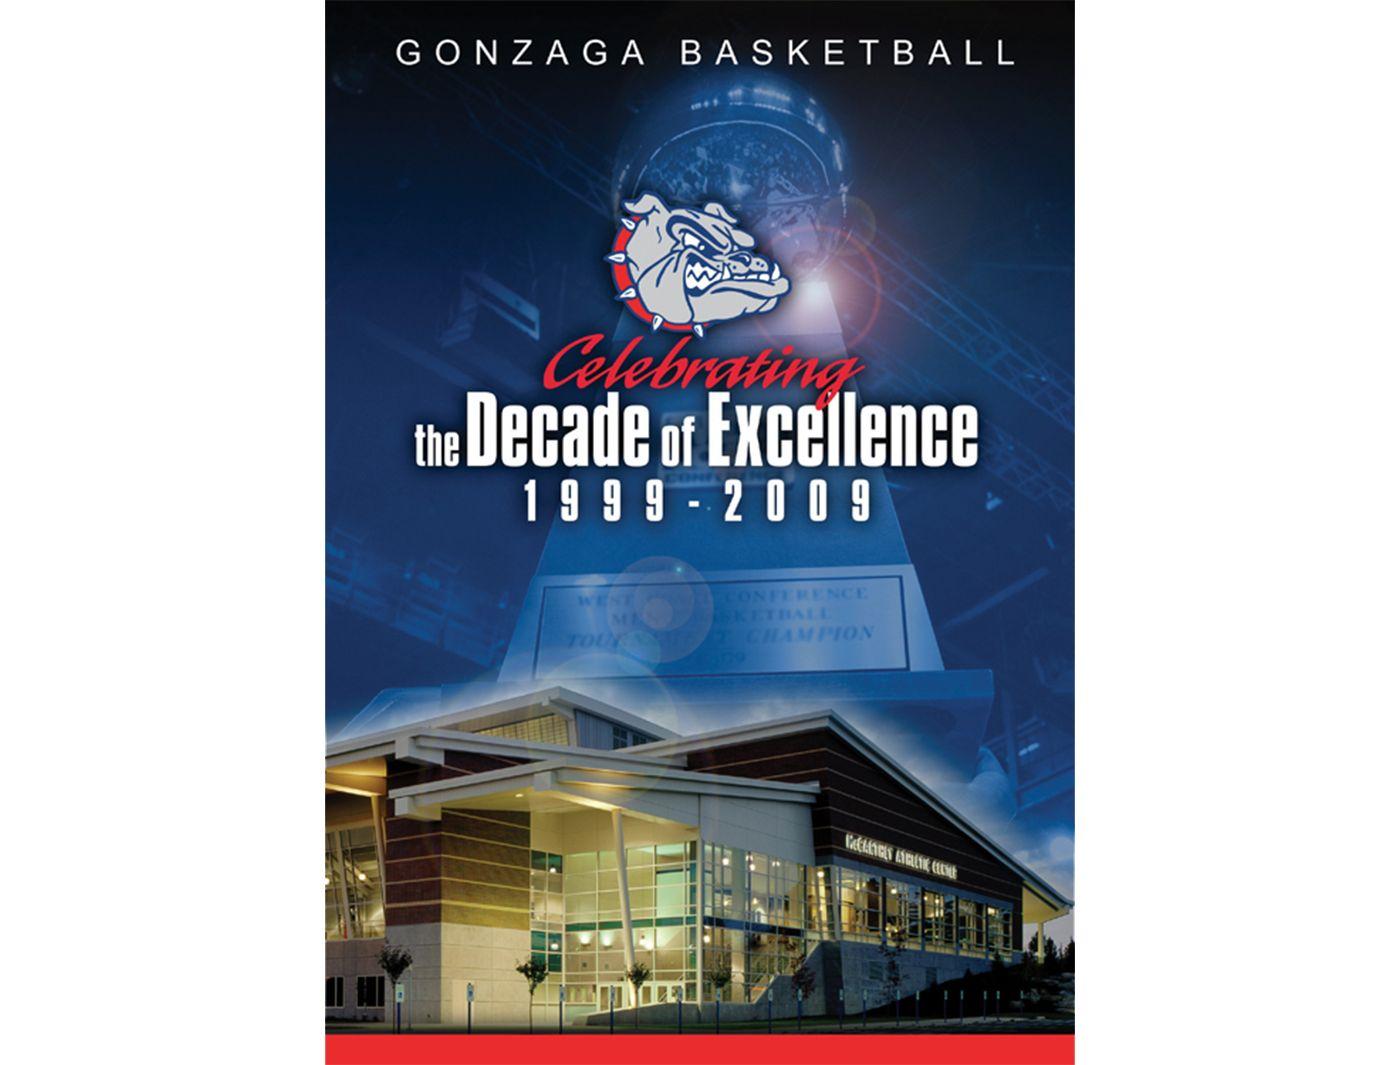 Gonzaga Basketball: Celebrating the Decade of Excellence (1999-2009) DVD